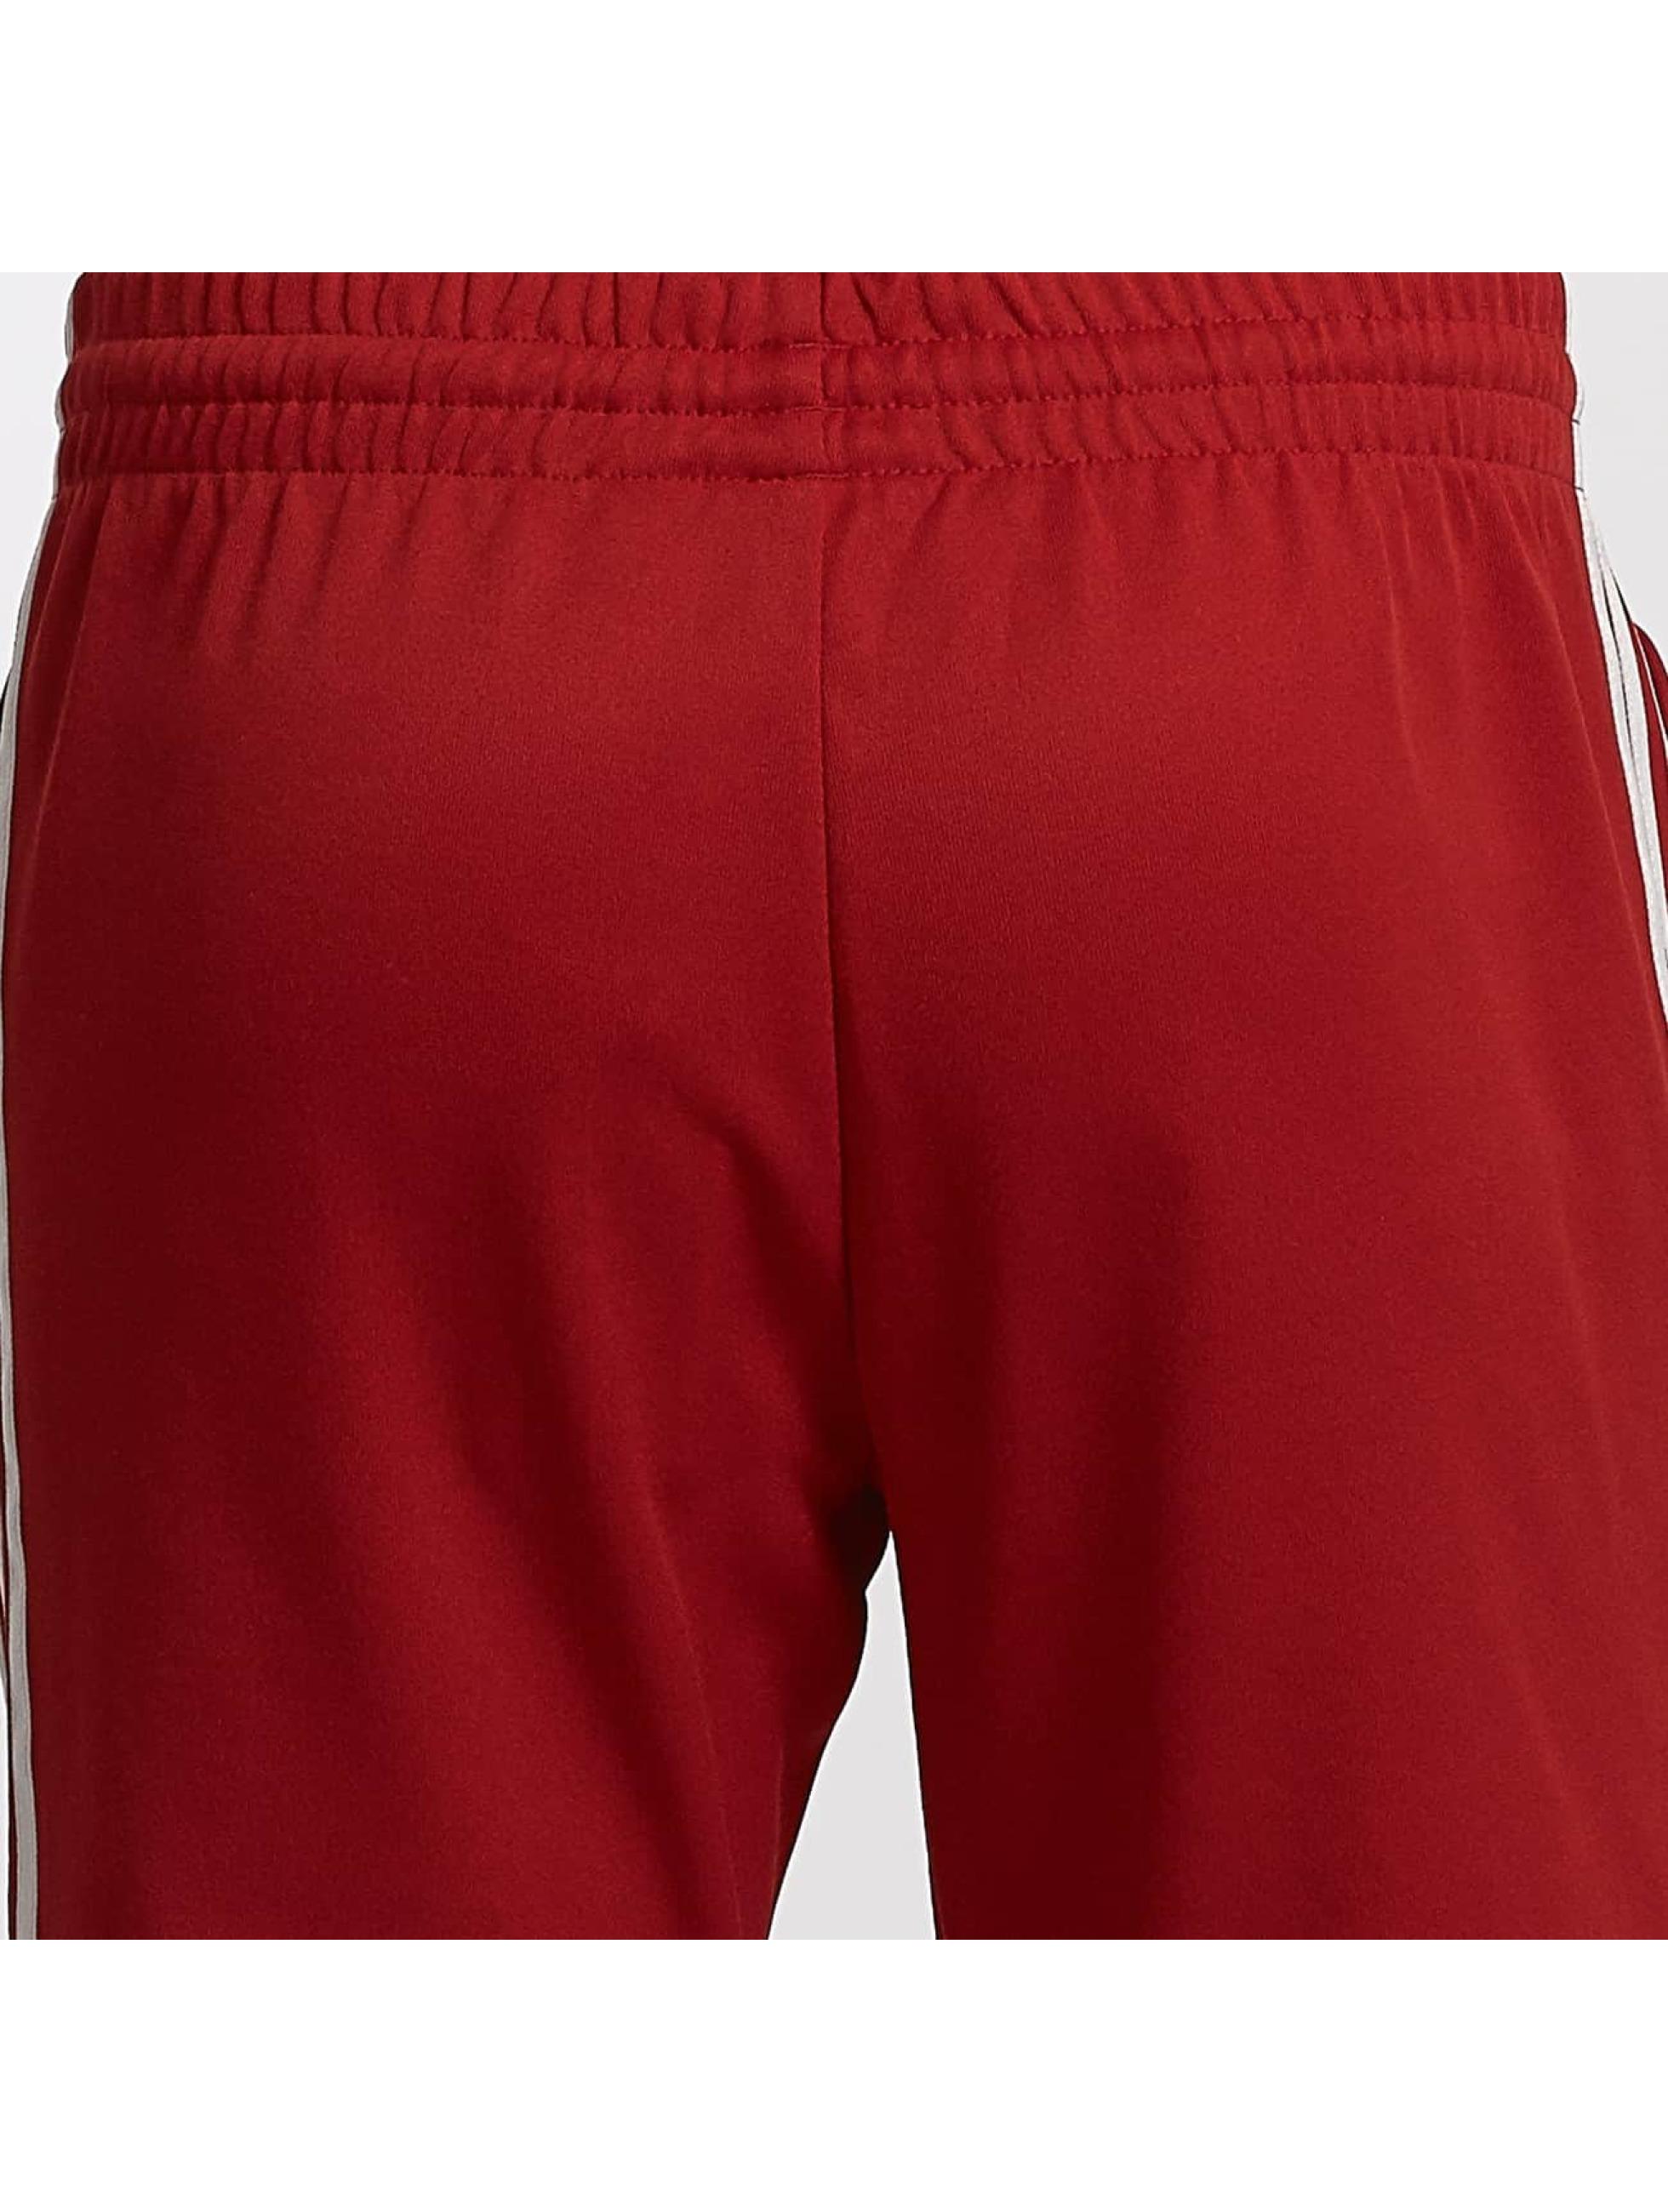 adidas joggingbroek Superstar rood